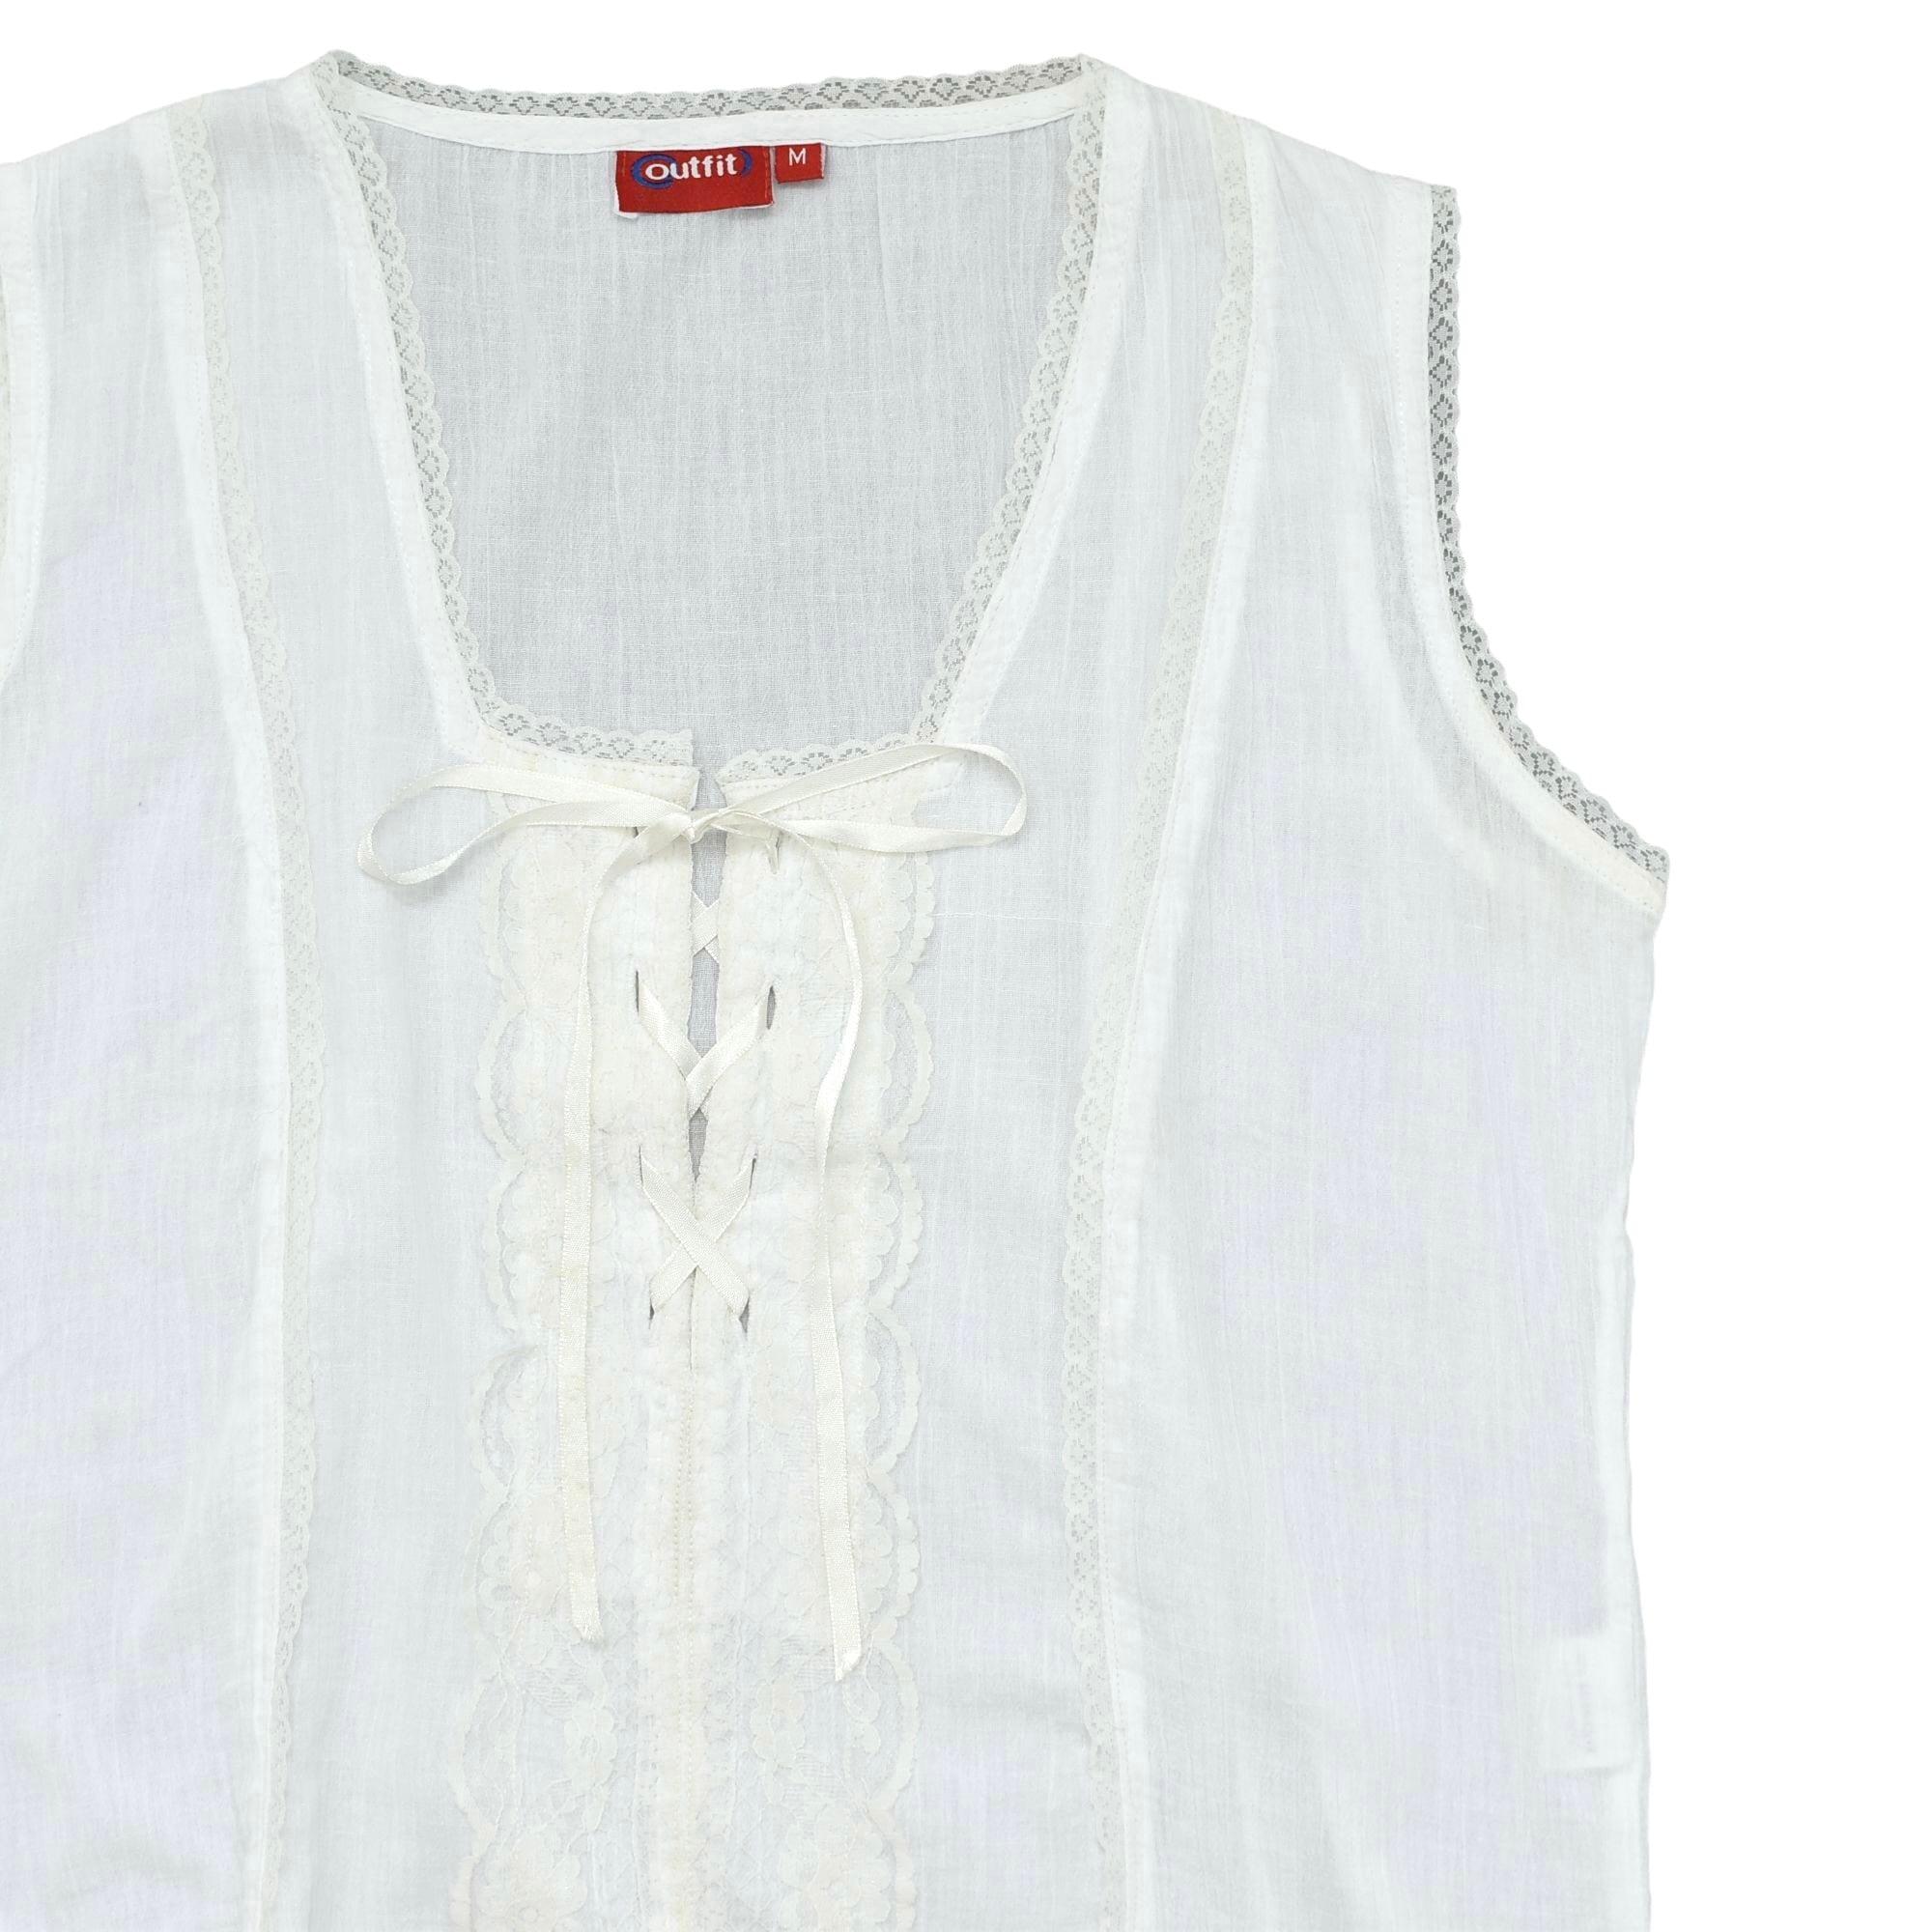 Eur vtg outfit crepe  sleeveless blouse